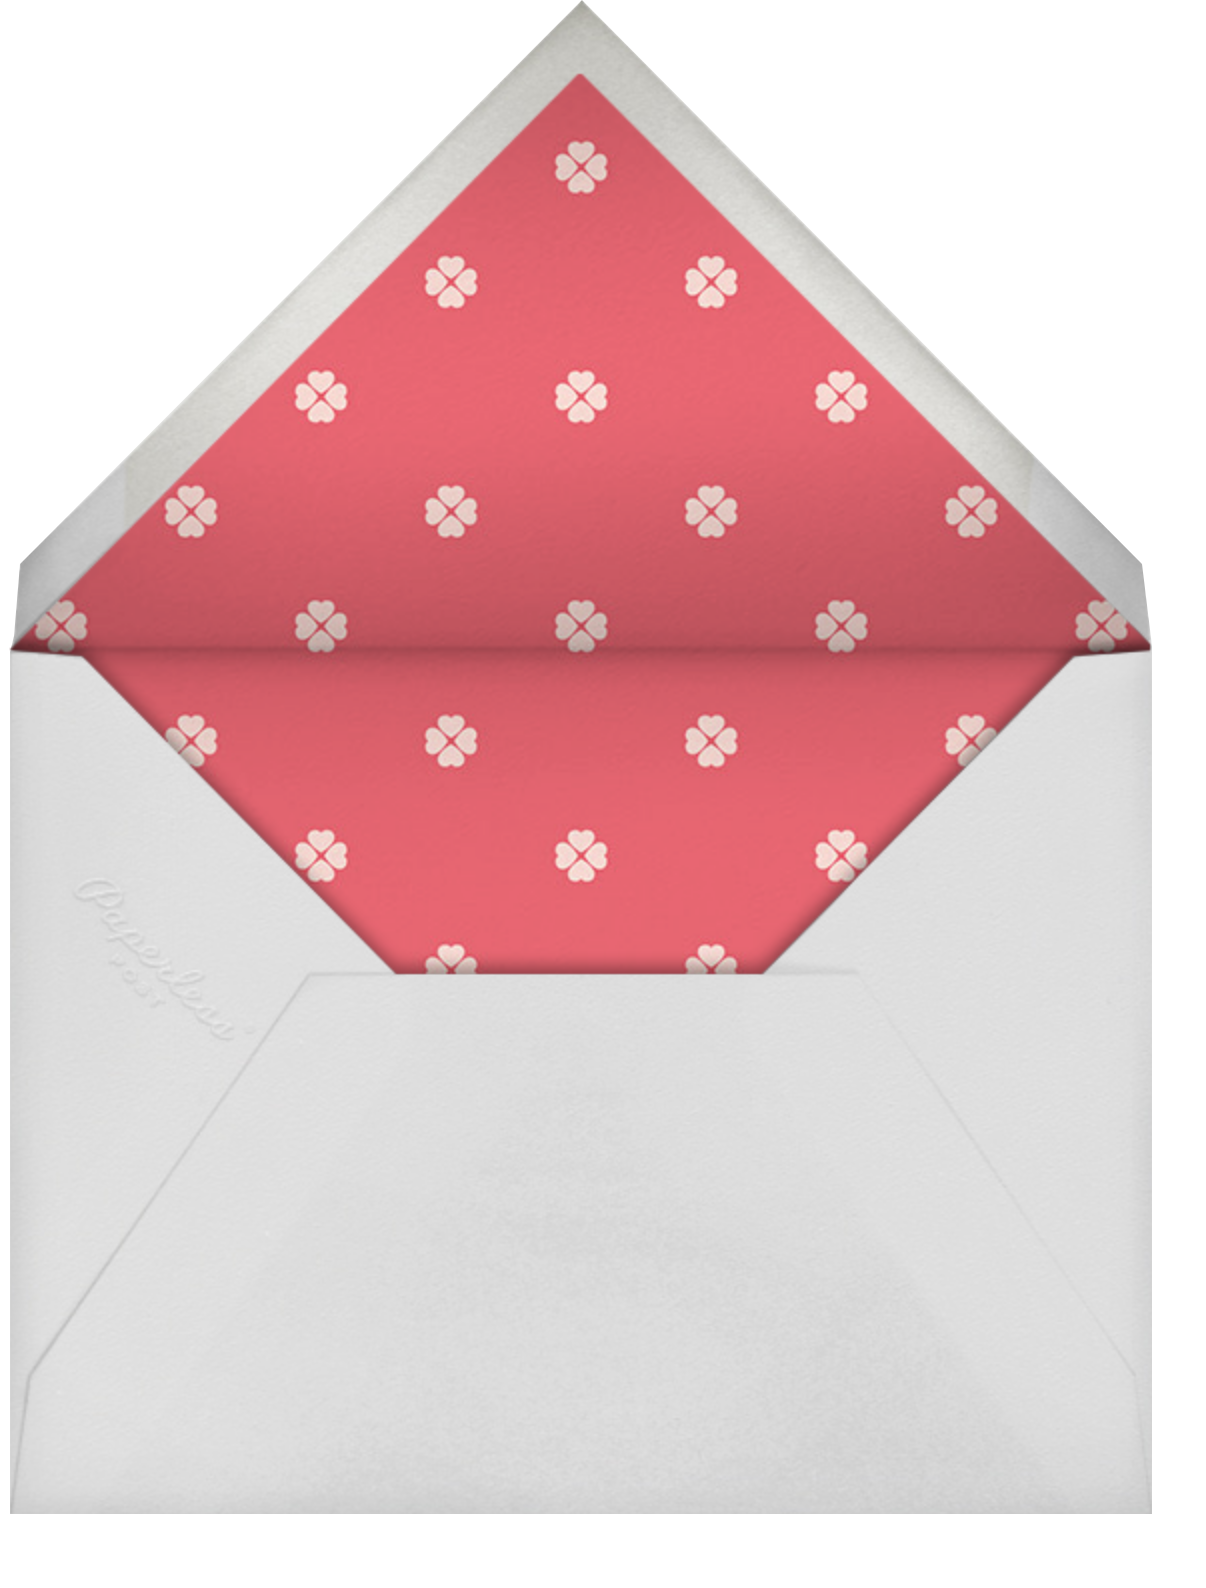 Colorblocked Border - Pink - kate spade new york - Adult birthday - envelope back